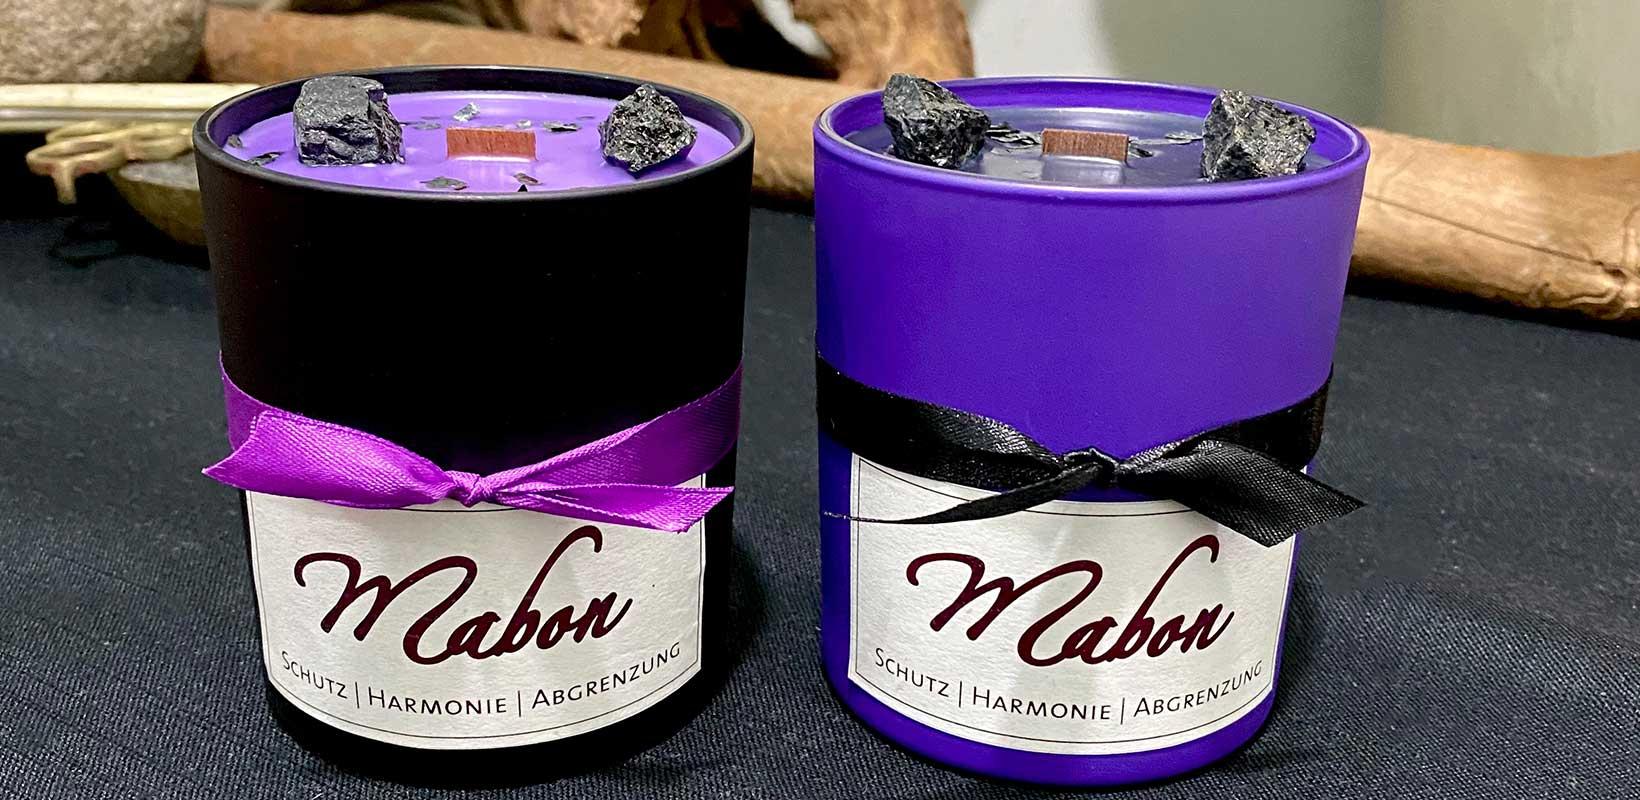 Mabon-Kerzen